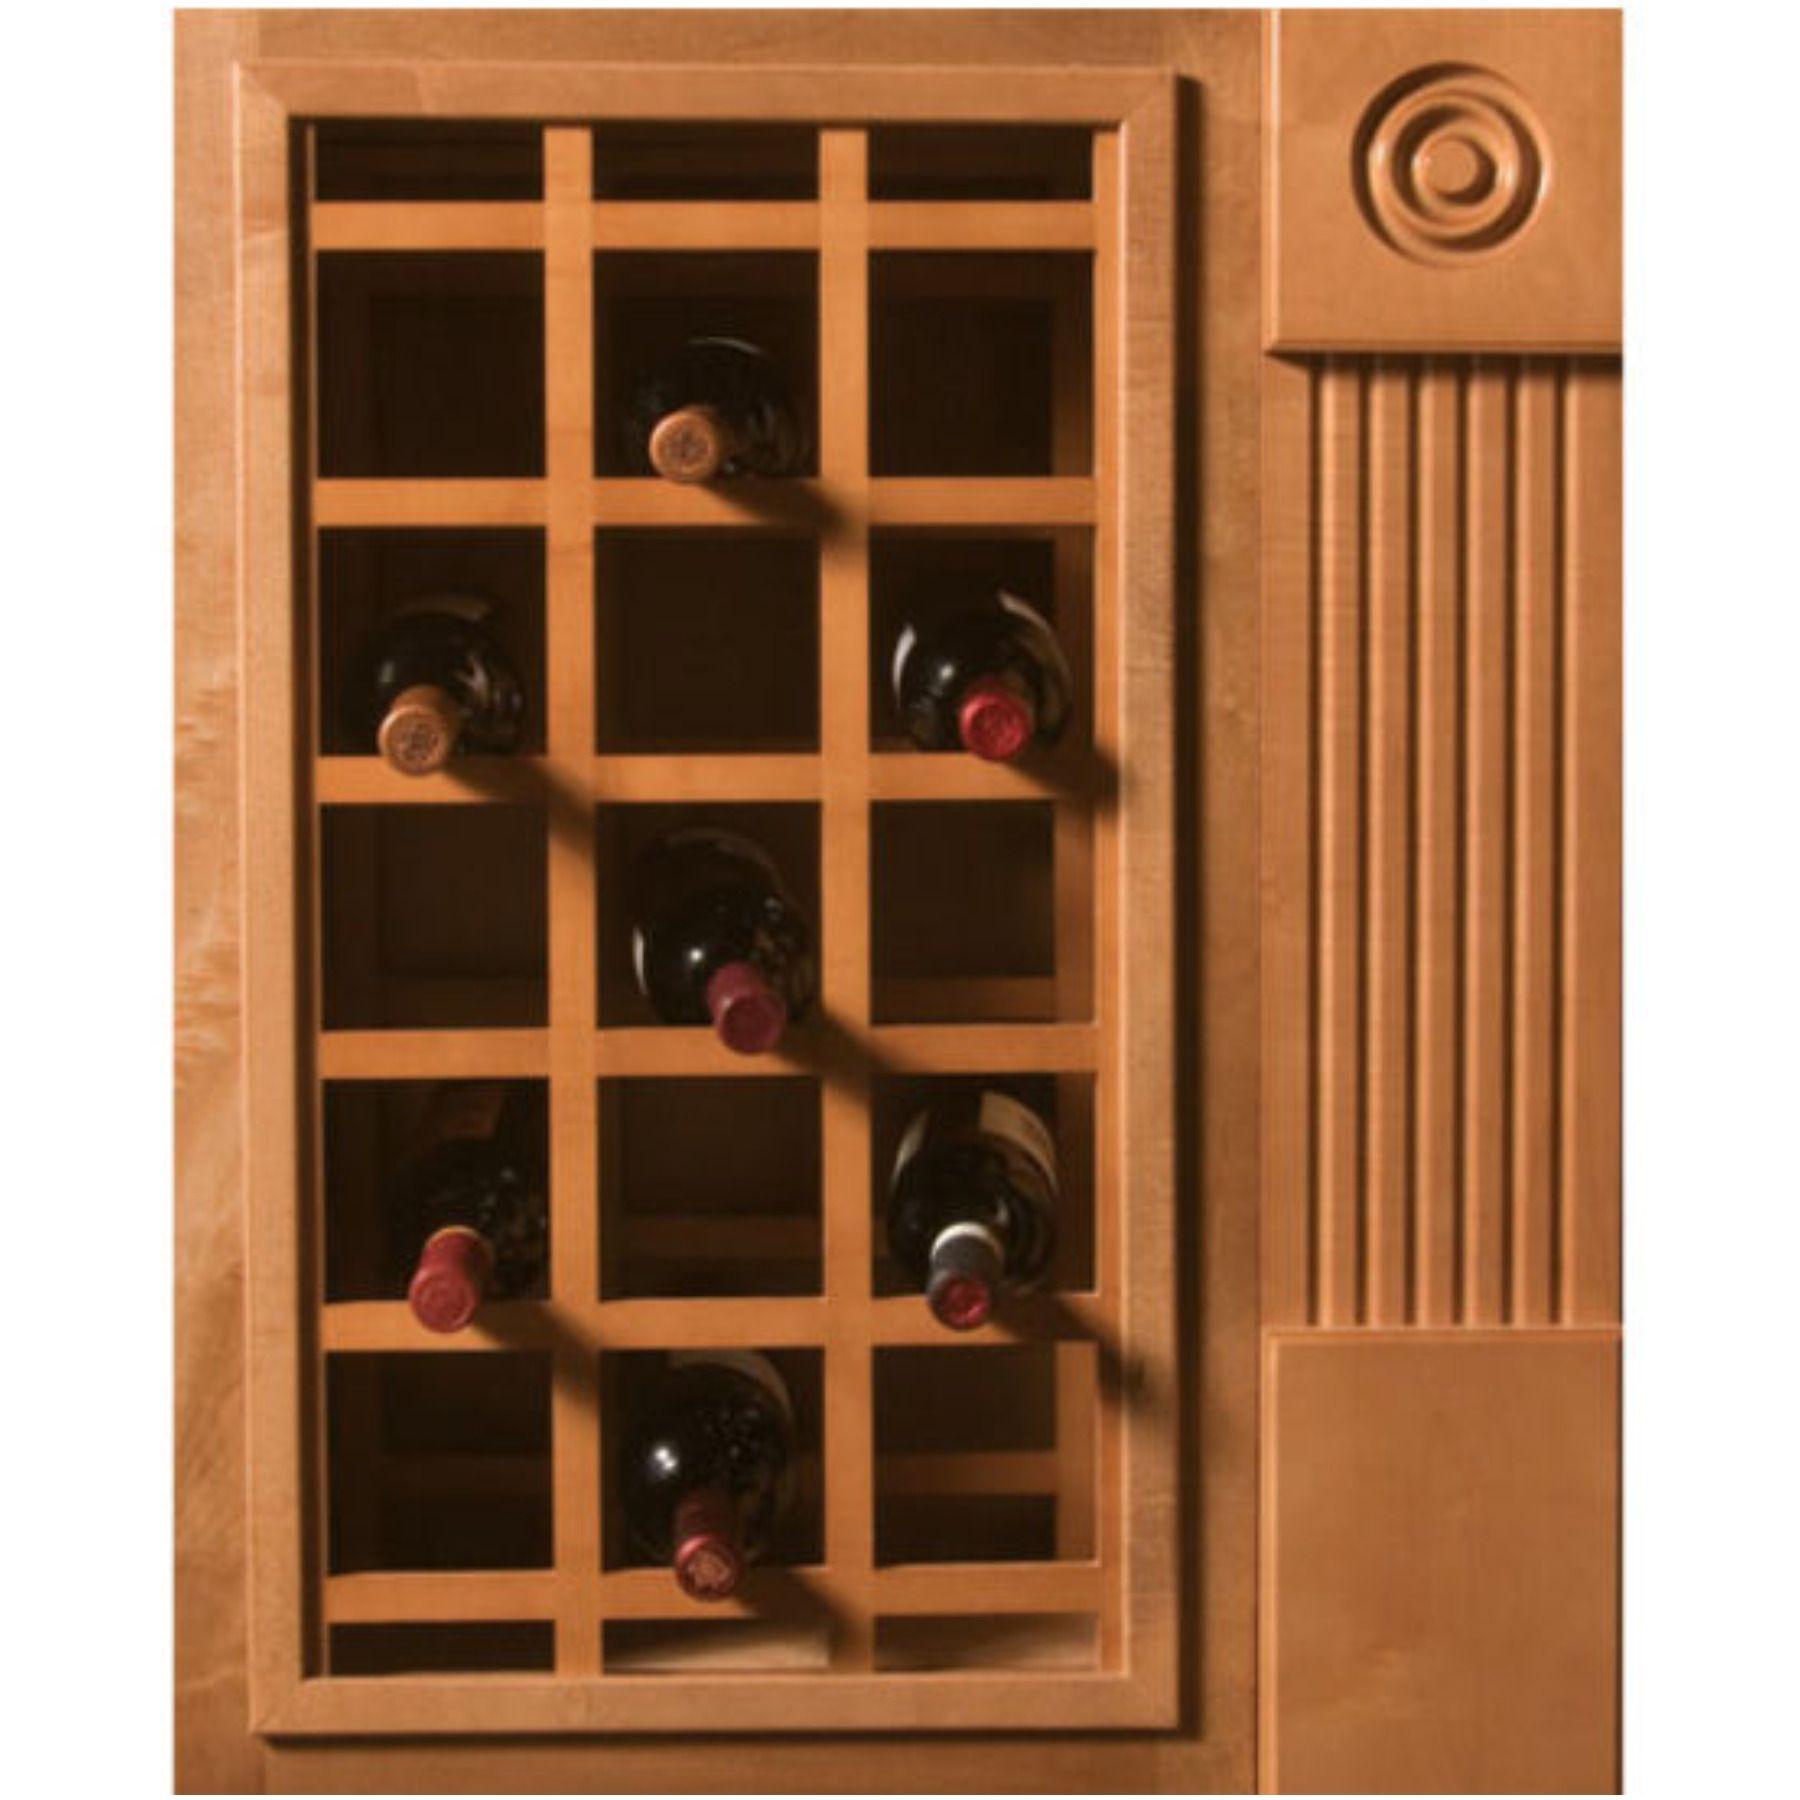 18 Bottle Capacity 17 Inch W X 29 Inch H Alder Unfinished Wood